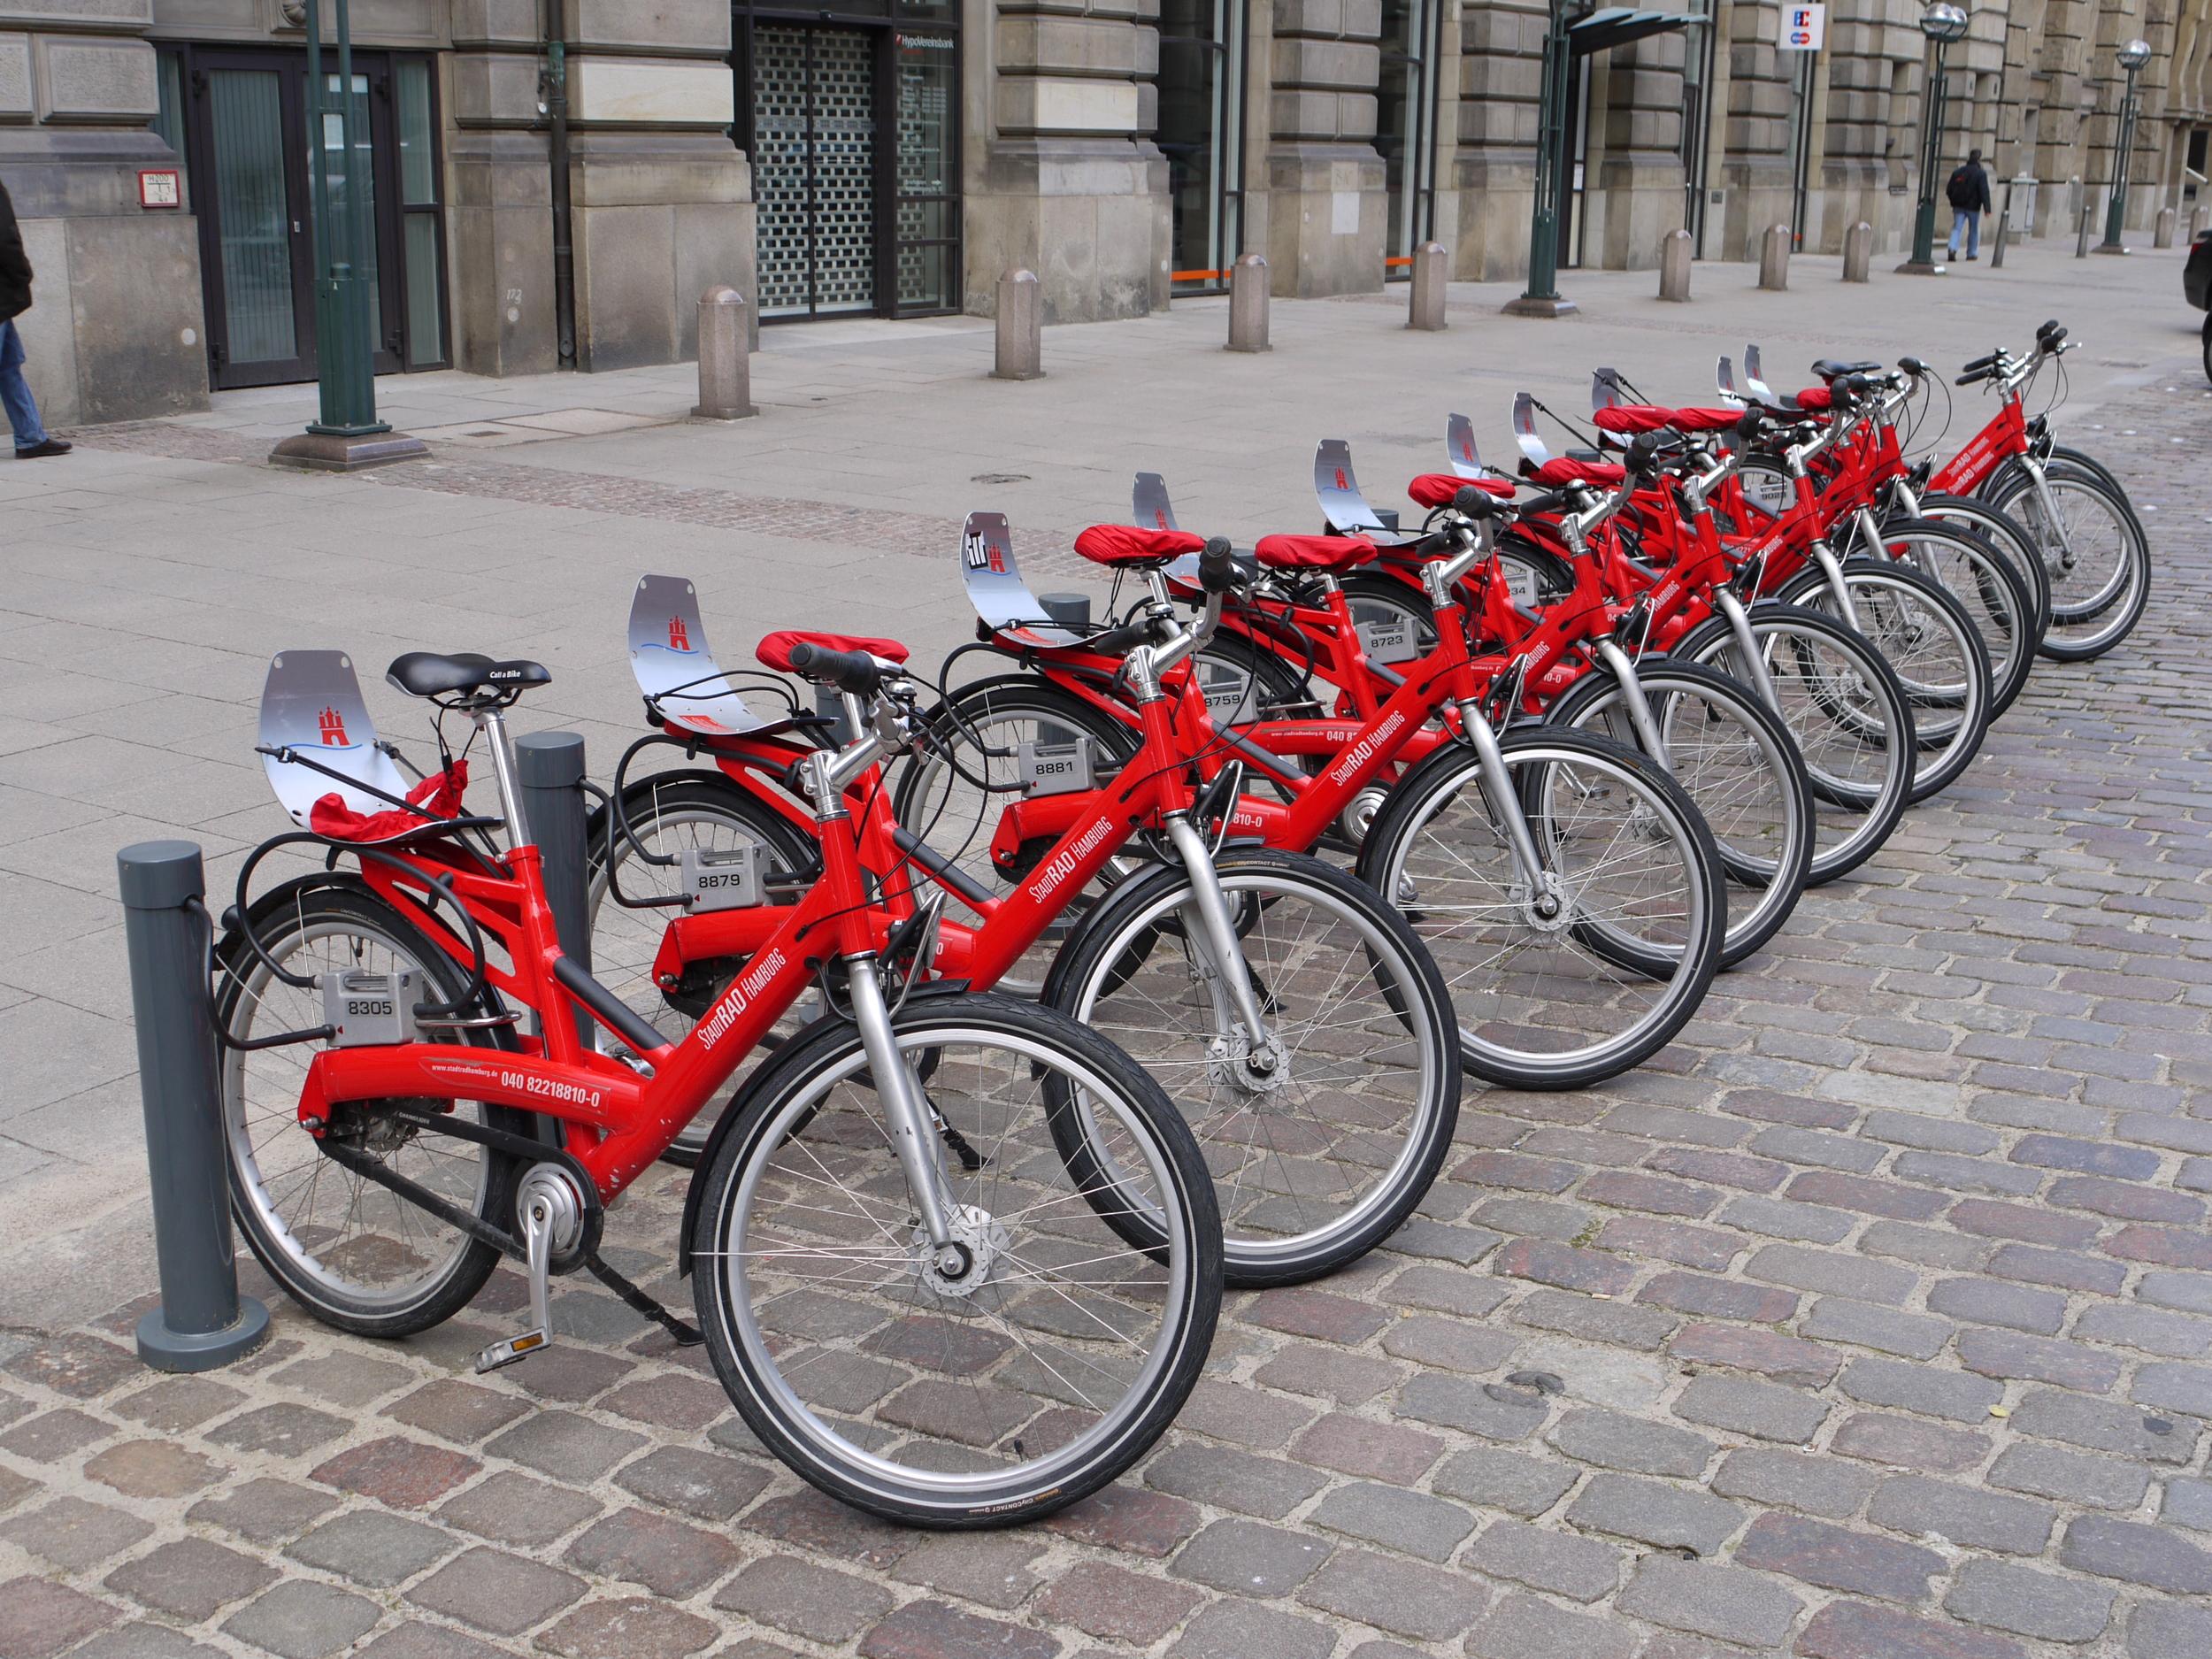 StadtRAD bikes | Photo courtesy of Kirsten Hassall